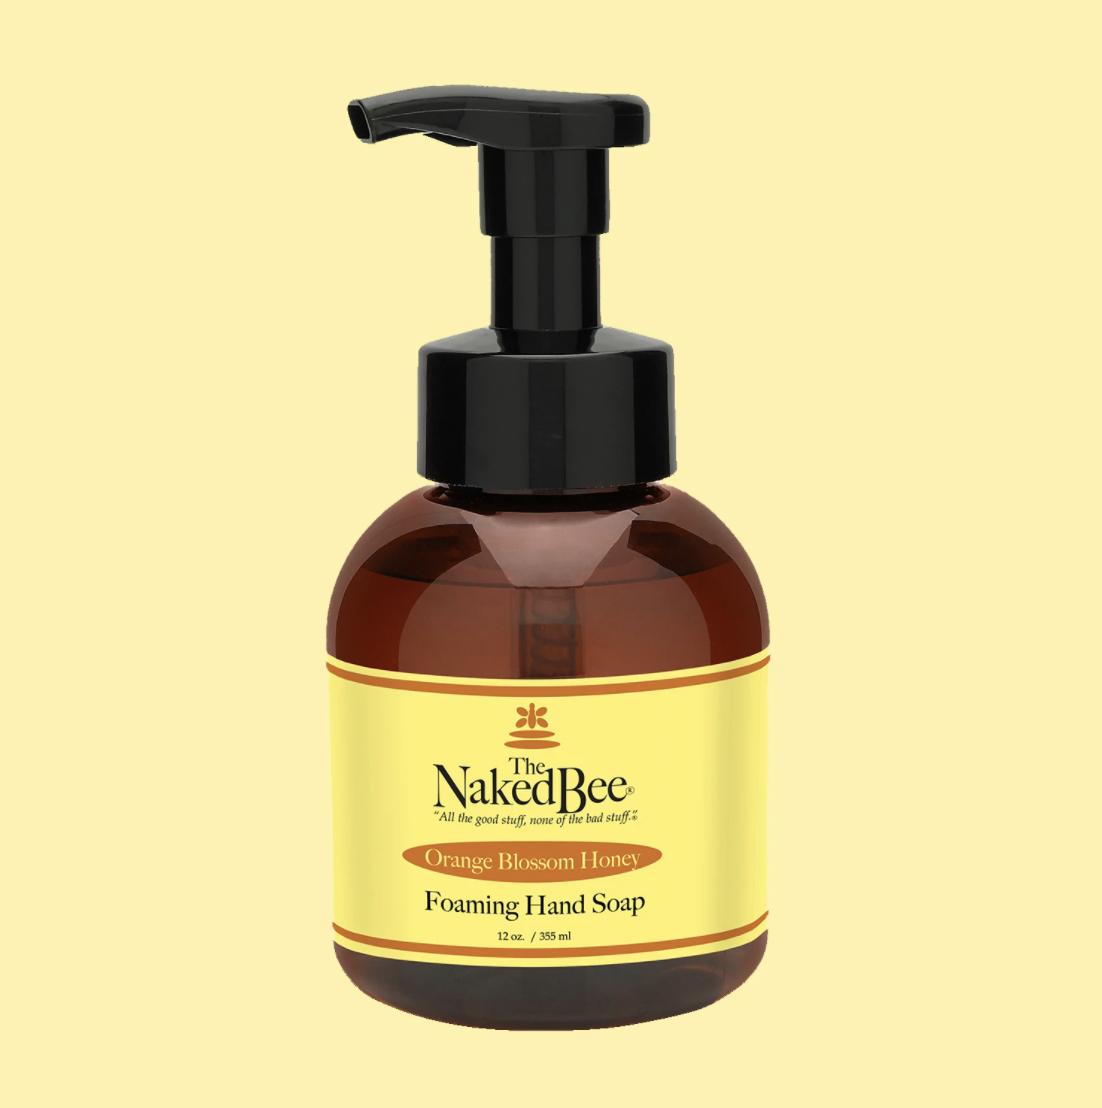 Foaming Hand Wash Orange Blossom Honey 12oz #NBFS-O